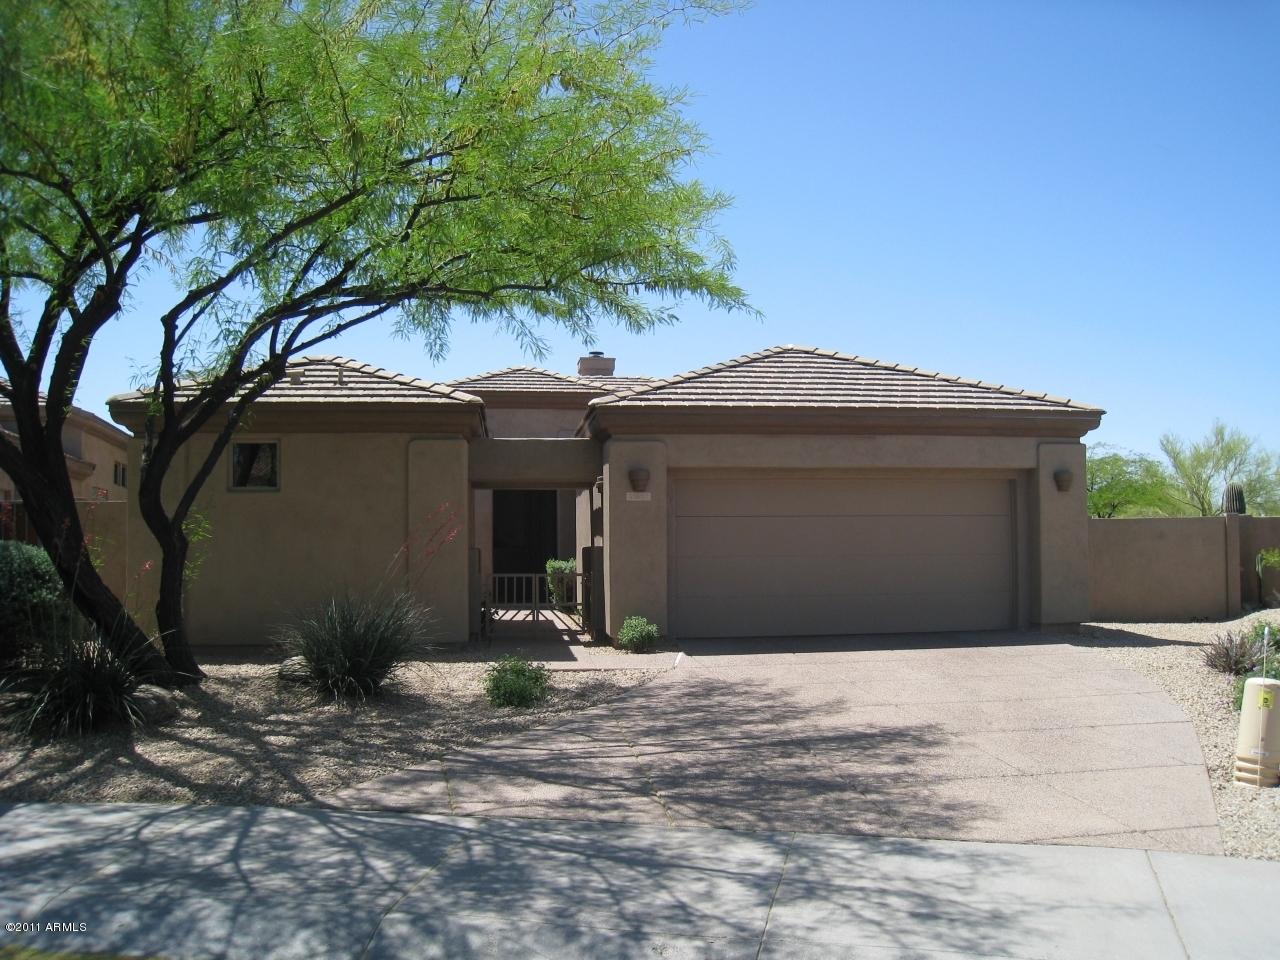 32627 70TH Street, Scottsdale, Arizona 85266, 3 Bedrooms Bedrooms, ,3 BathroomsBathrooms,Residential Rental,For Rent,70TH,6056021